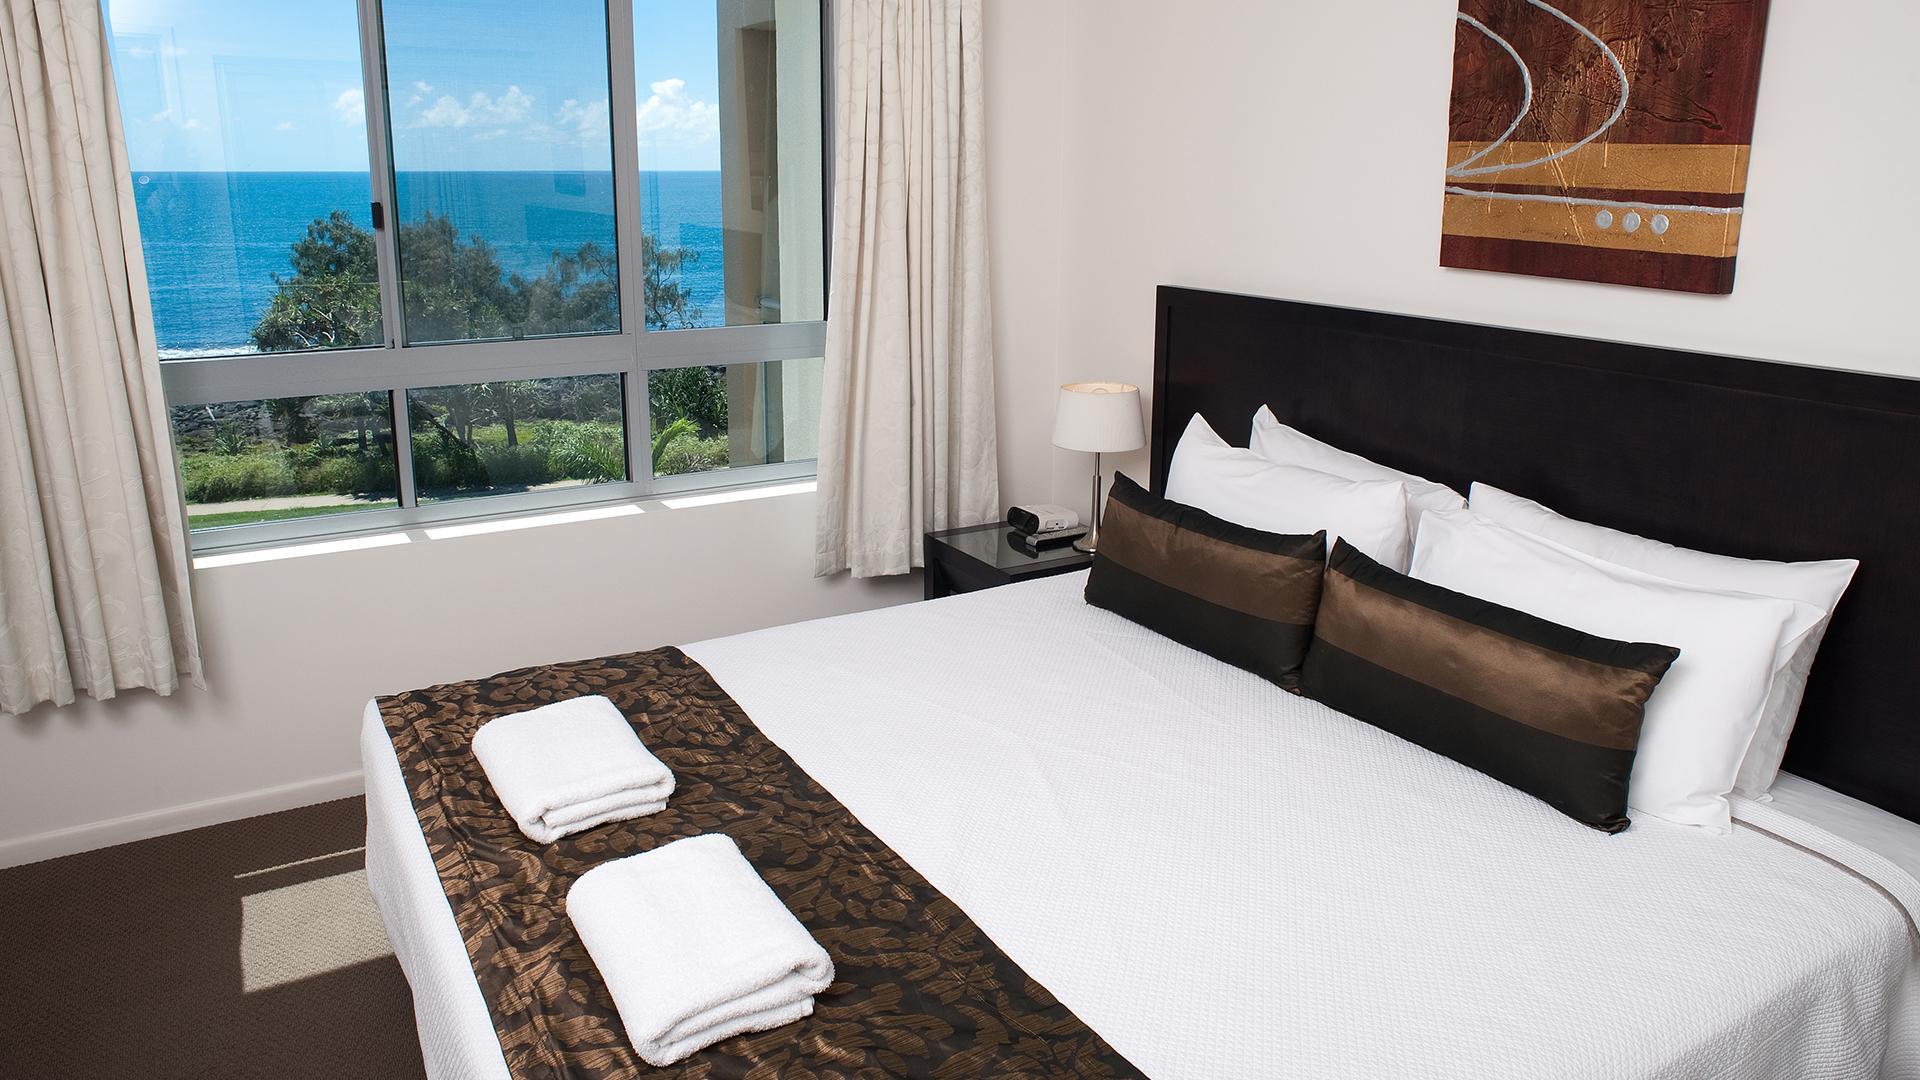 Two-Bedroom Ocean-View Apartment image 1 at The Point Resort by Bundaberg Regional, Queensland, Australia